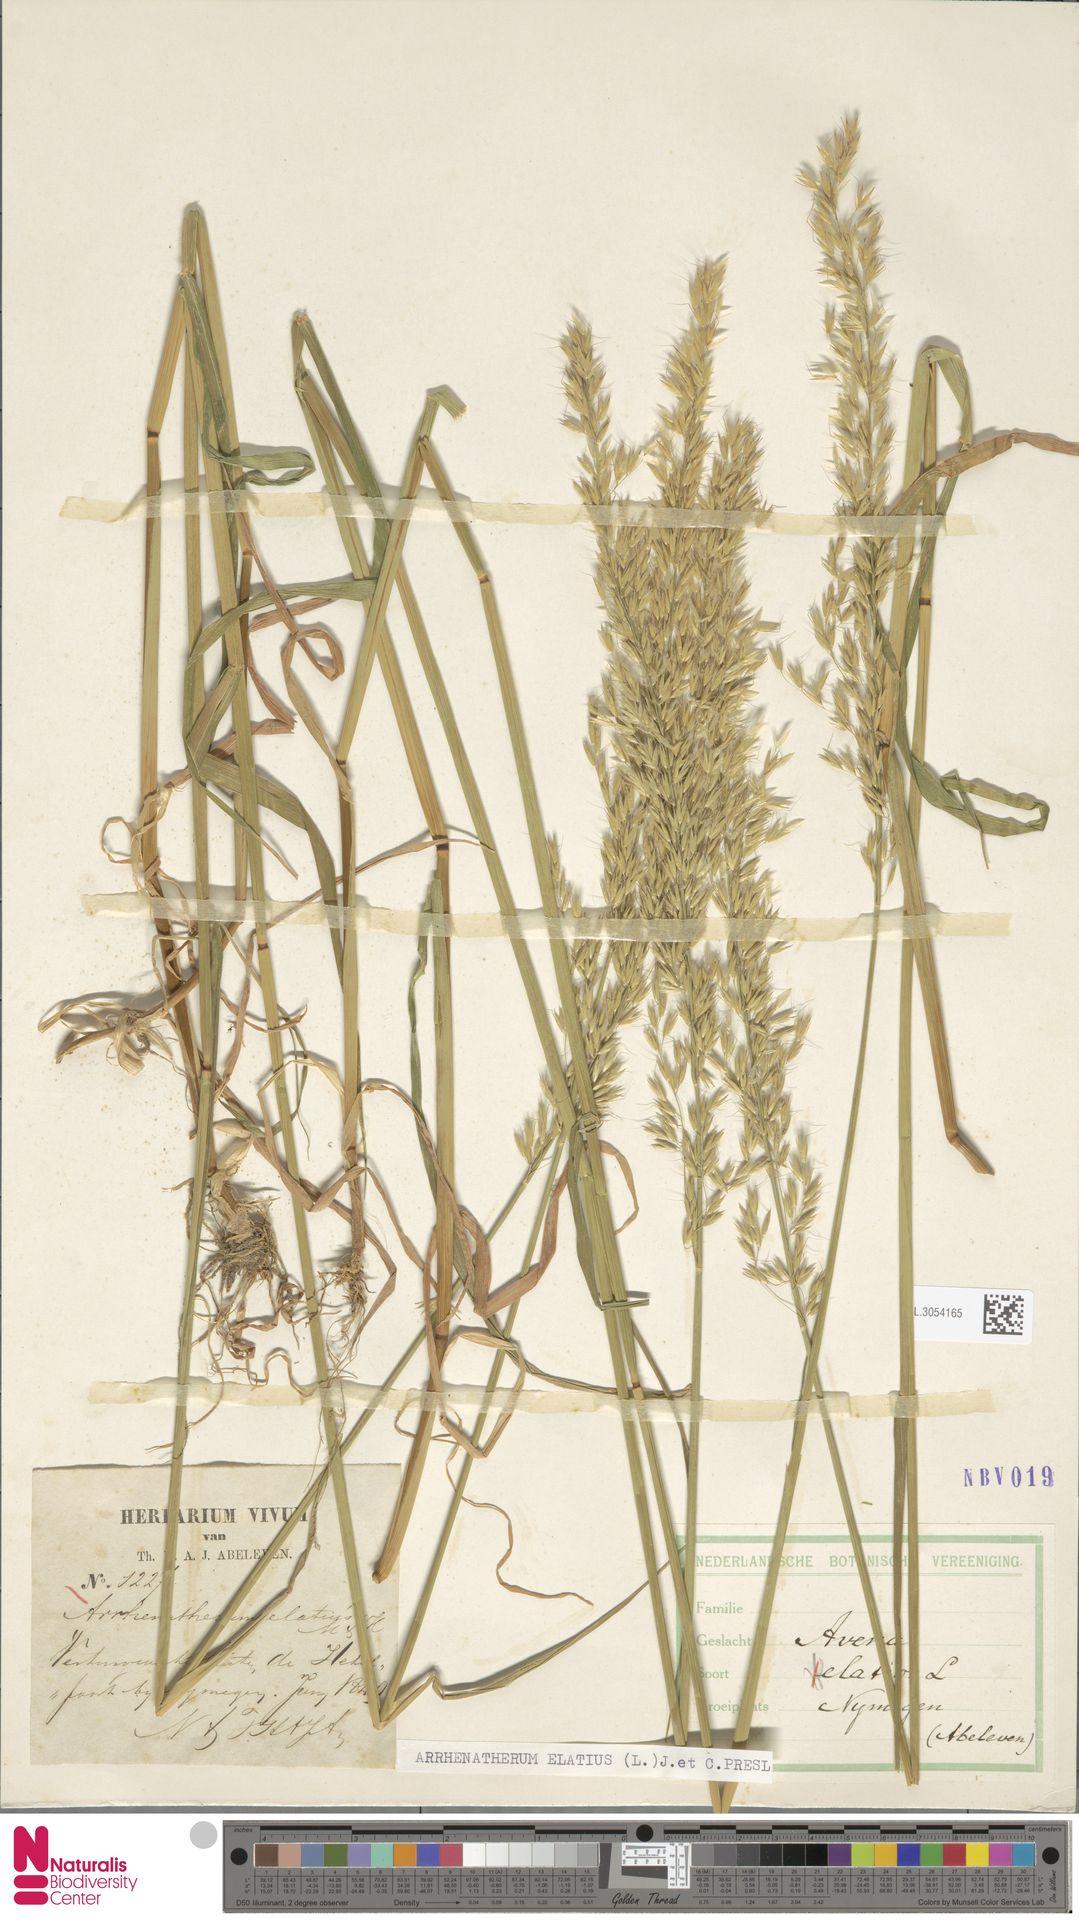 L.3054165   Arrhenatherum elatius (L.) P.Beauv. ex J.Presl & C.Presl